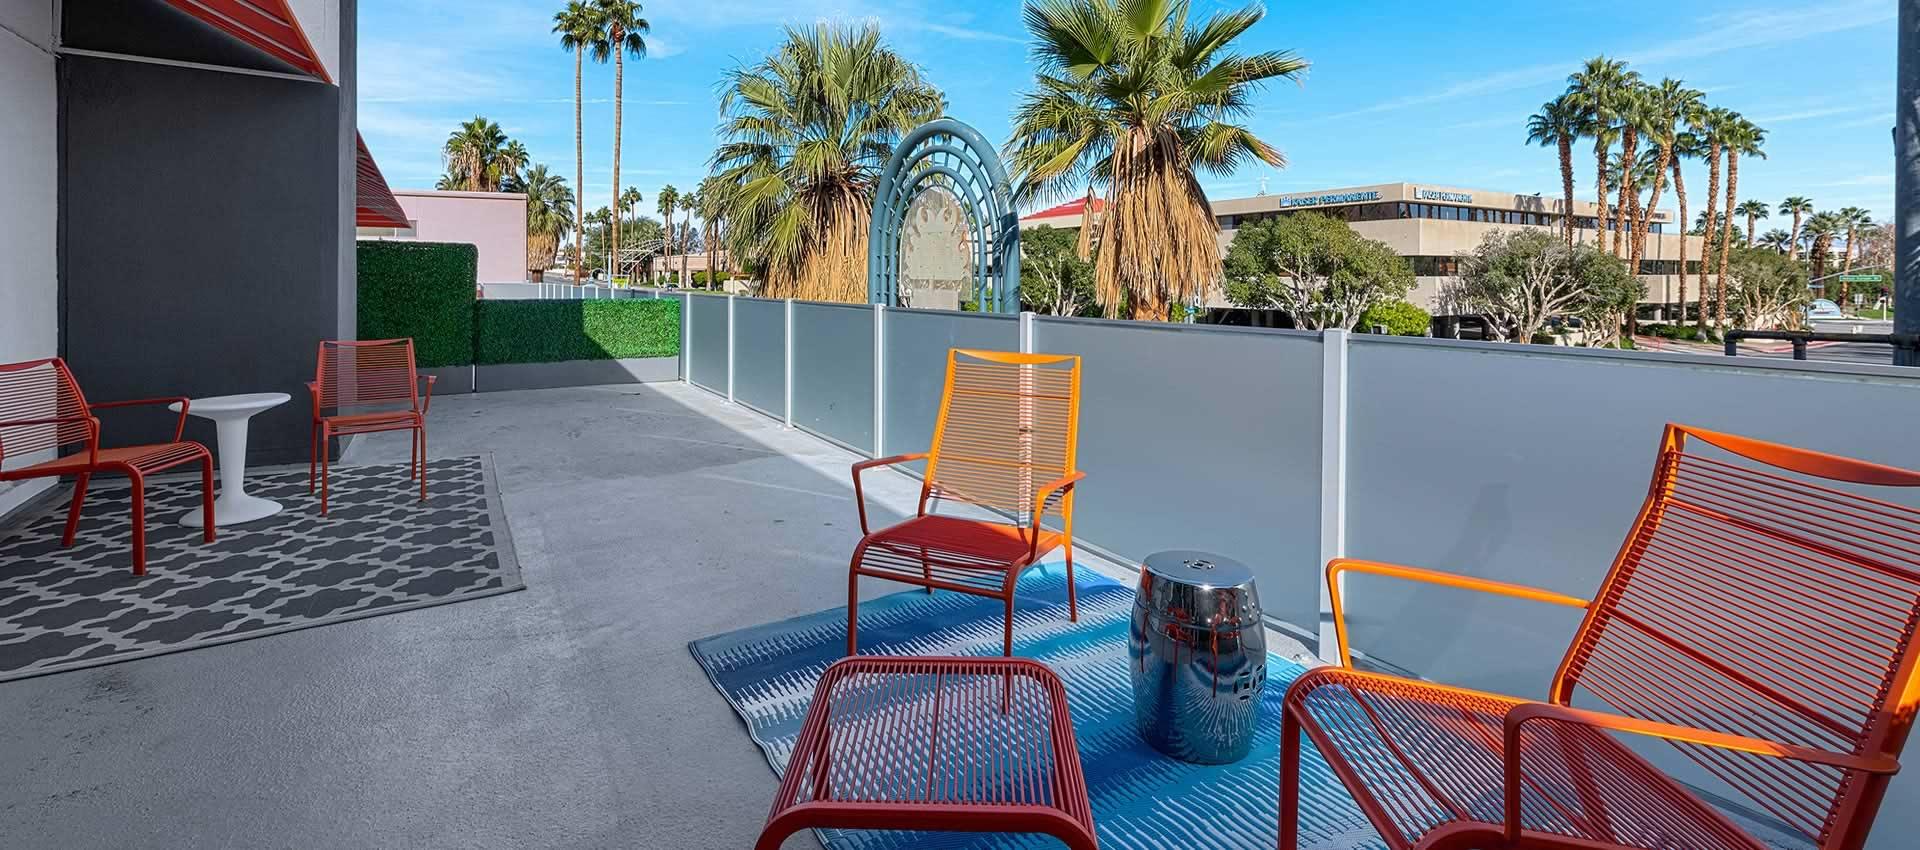 twist hotel room 218 patio